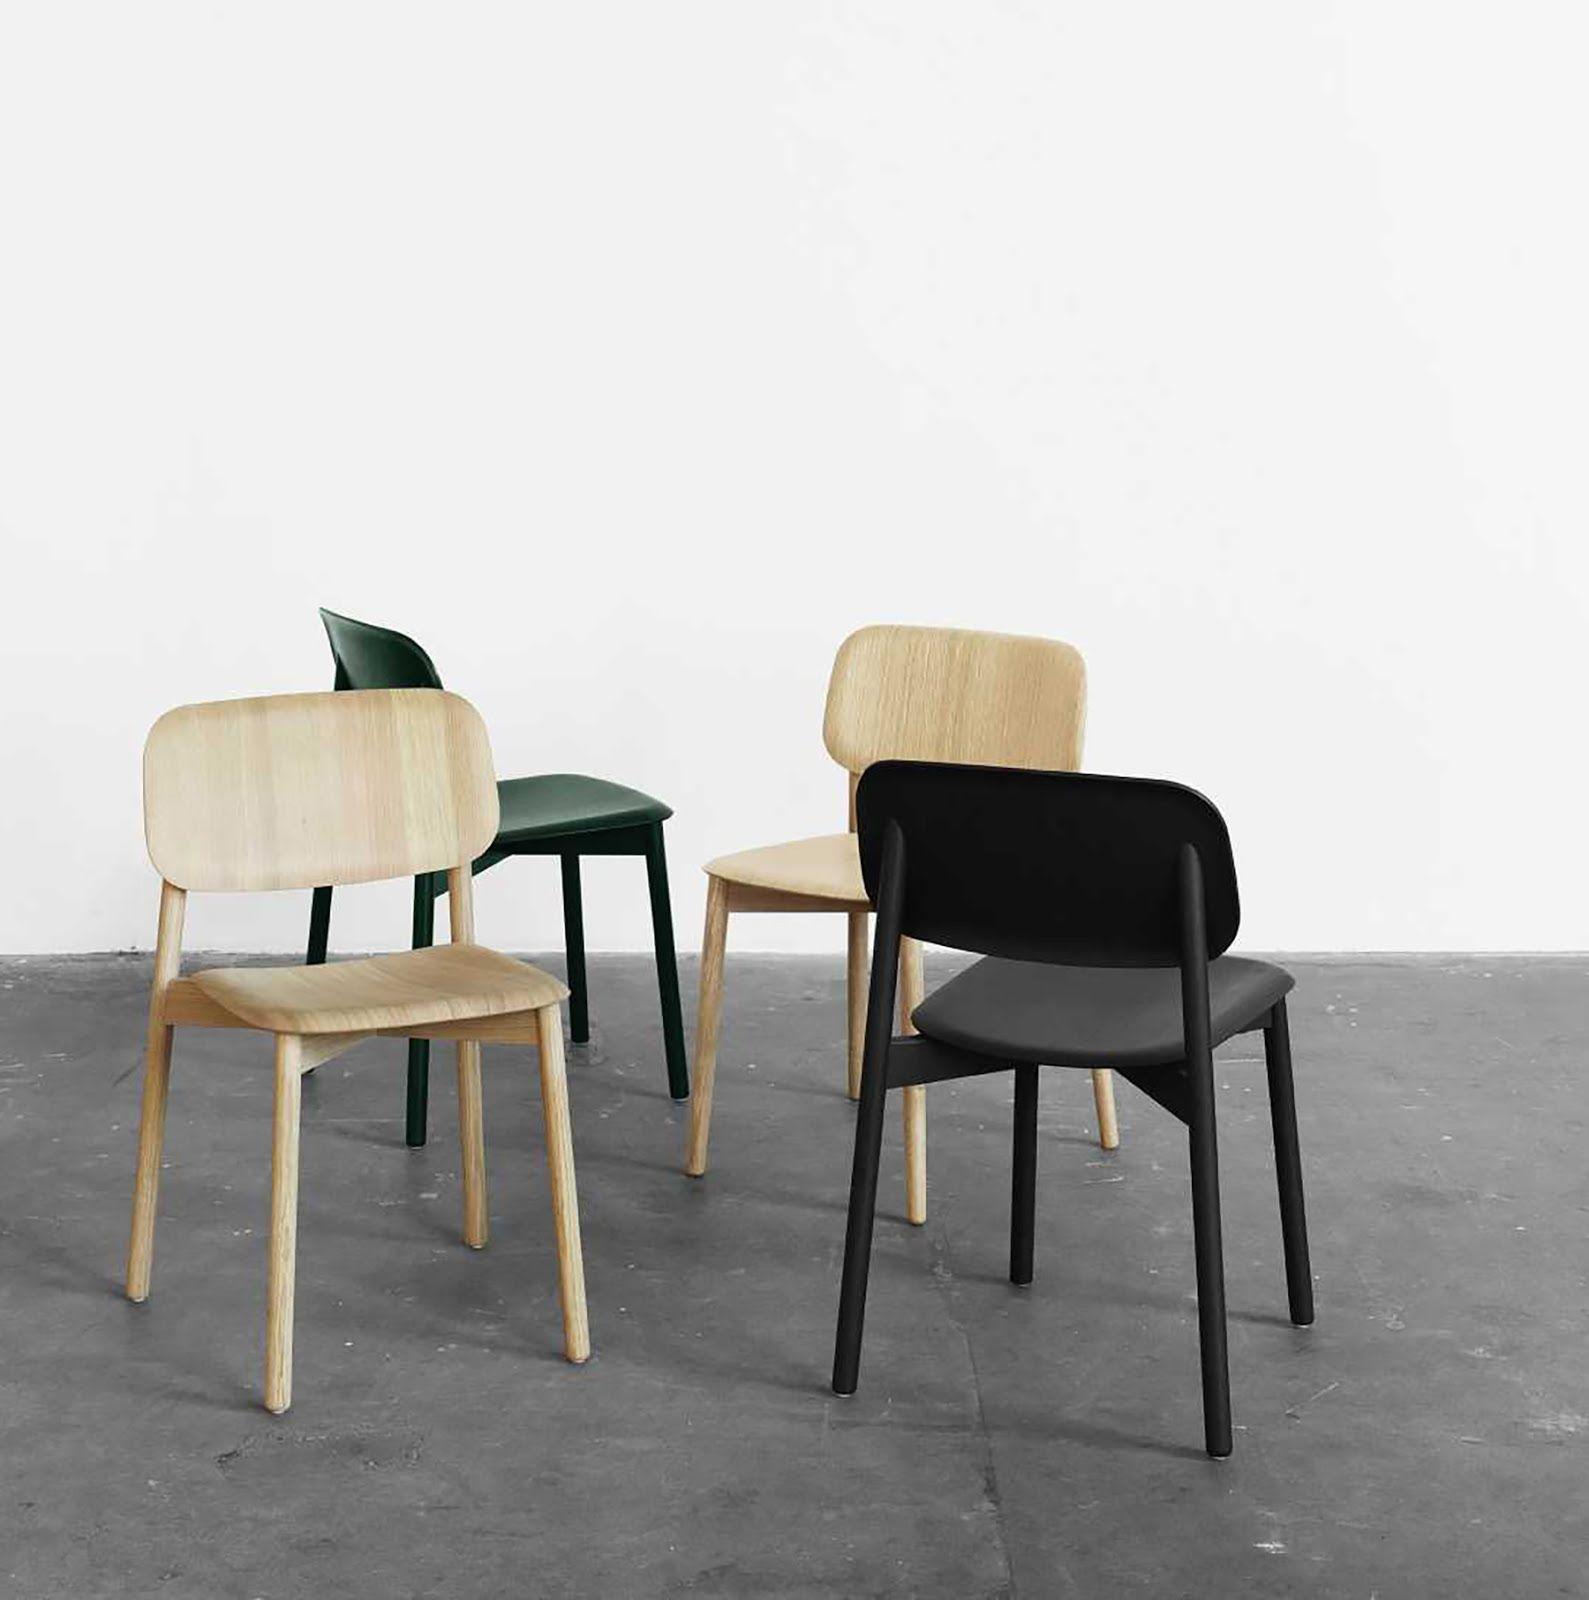 Scandinavische Design Stoelen.Turn It Inside Out Best Hay Chairs Hay Chairs Mister Design